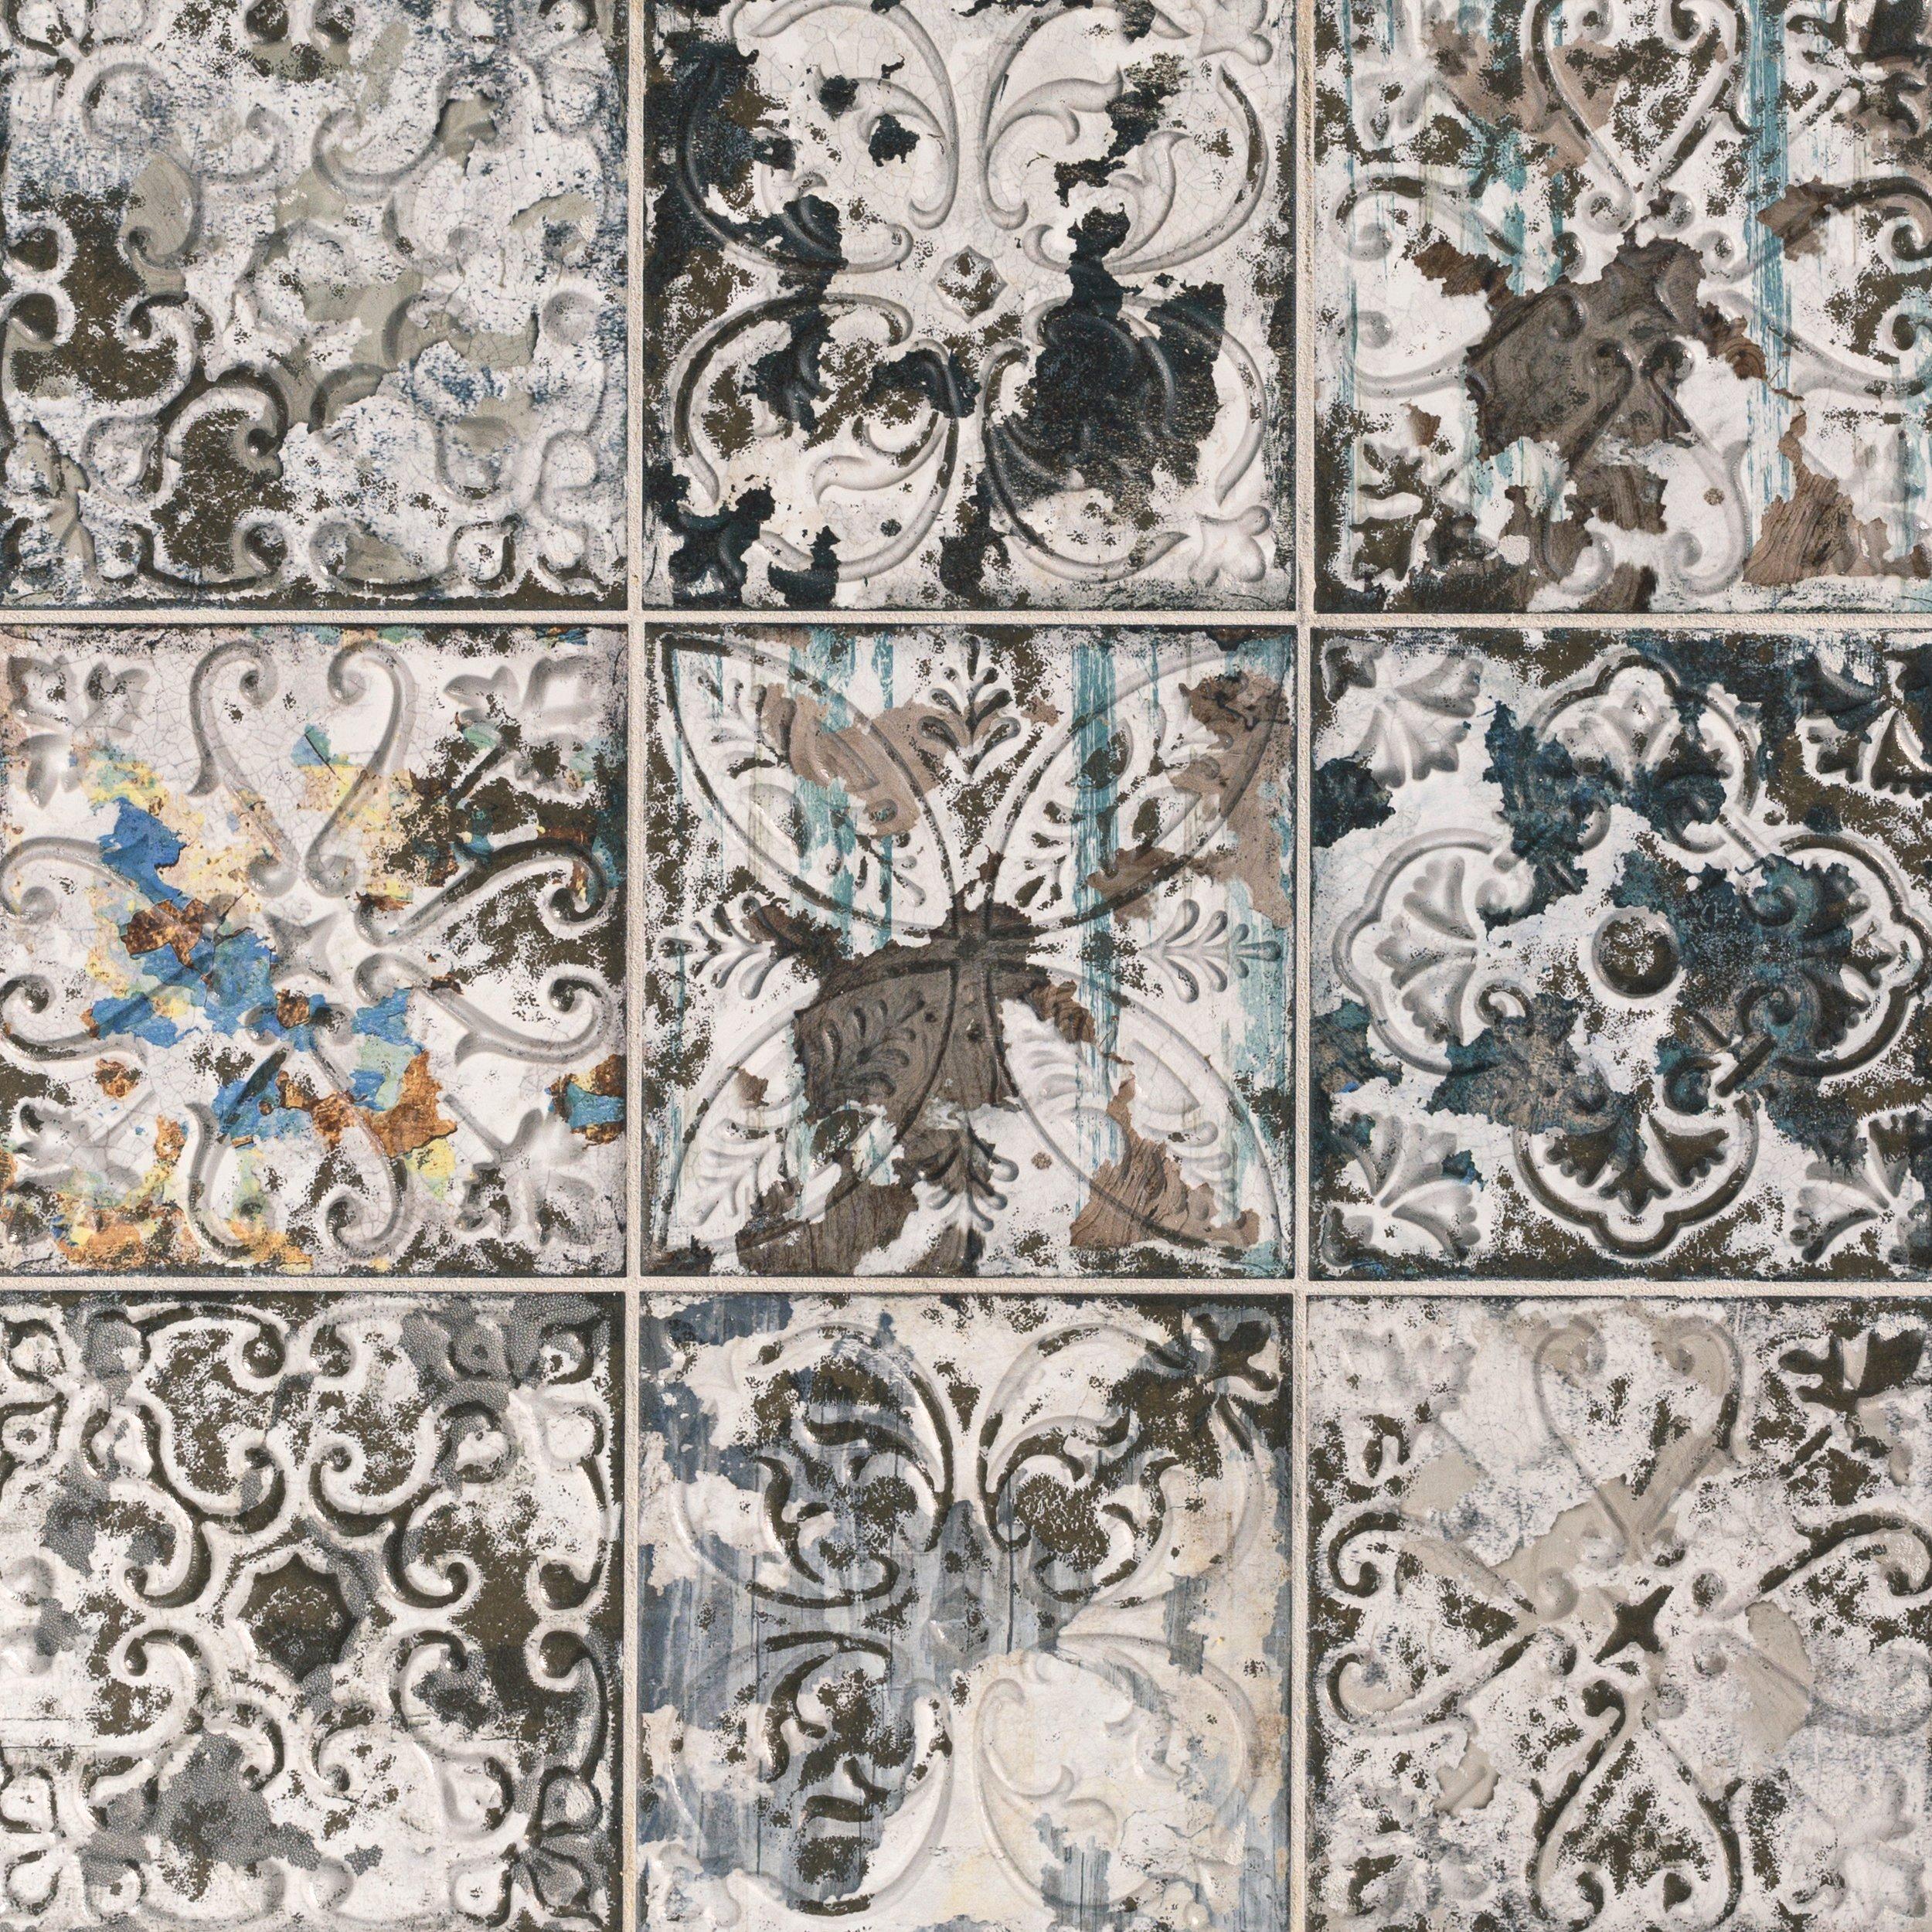 Ornato Aged Dark Ceramic Tile Products Pinterest Dark Clean